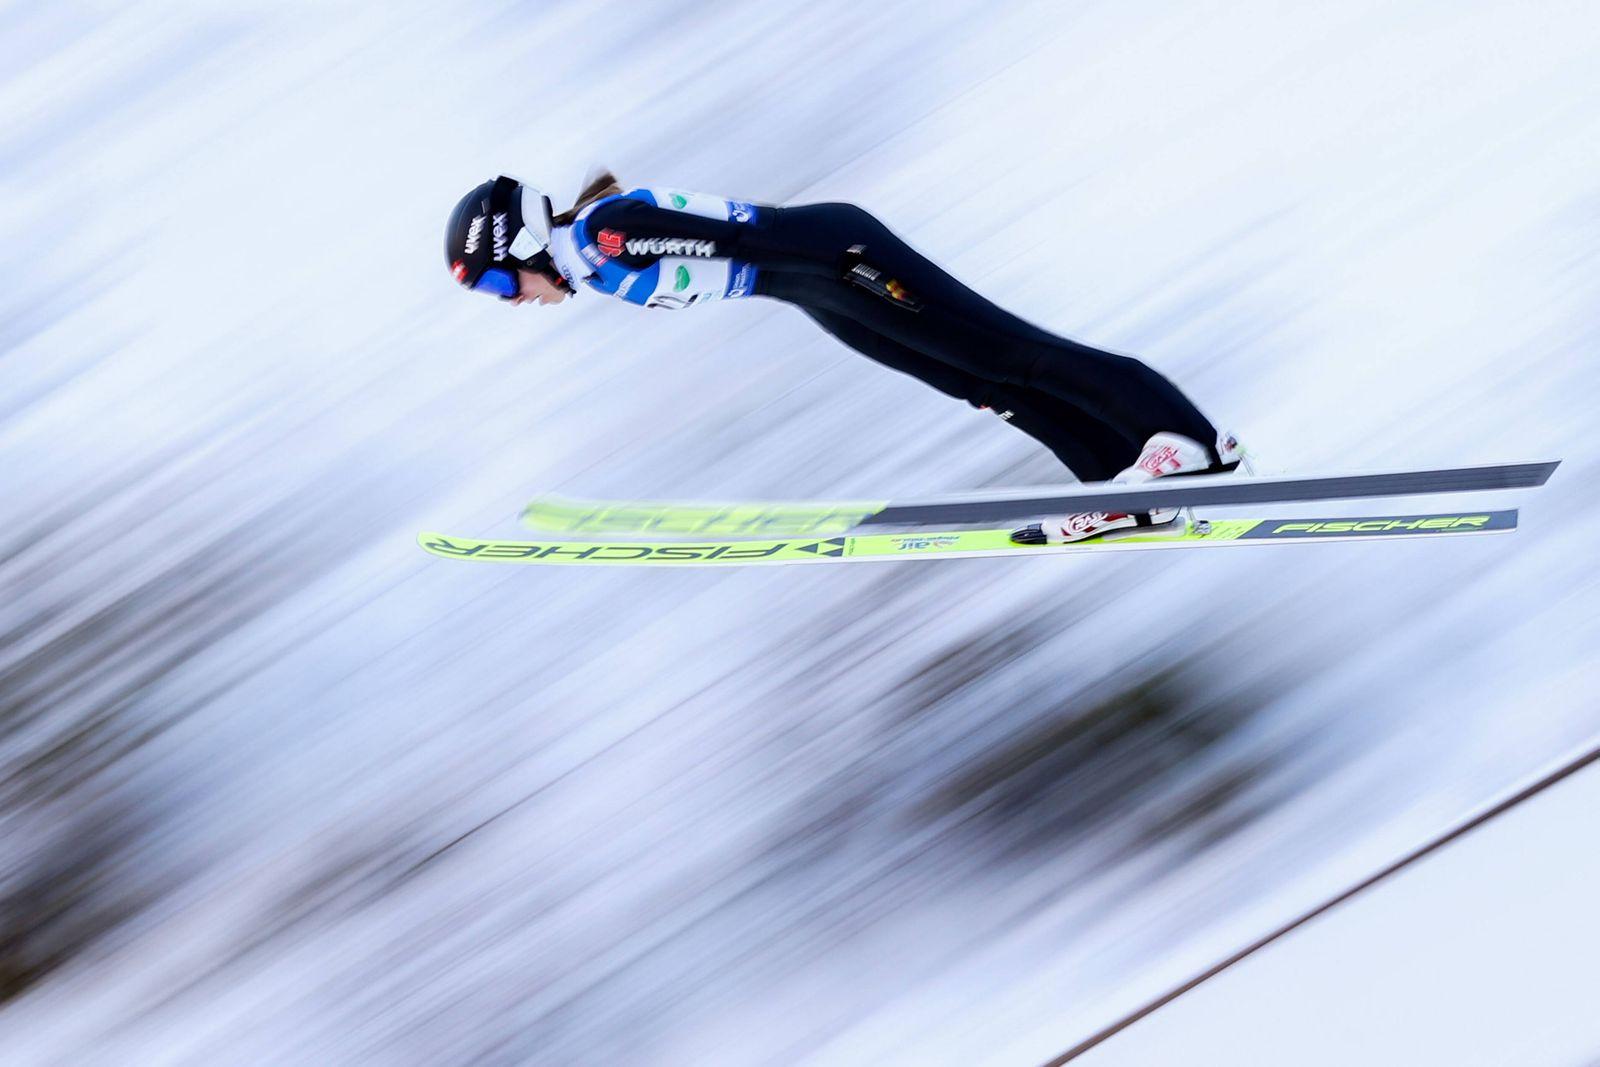 NORDIC COMBINED - FIS WC Ramsau RAMSAU,AUSTRIA,17.DEC.20 - NORDIC SKIING, NORDIC COMBINED, Ski jumping, Skispringen, Sk